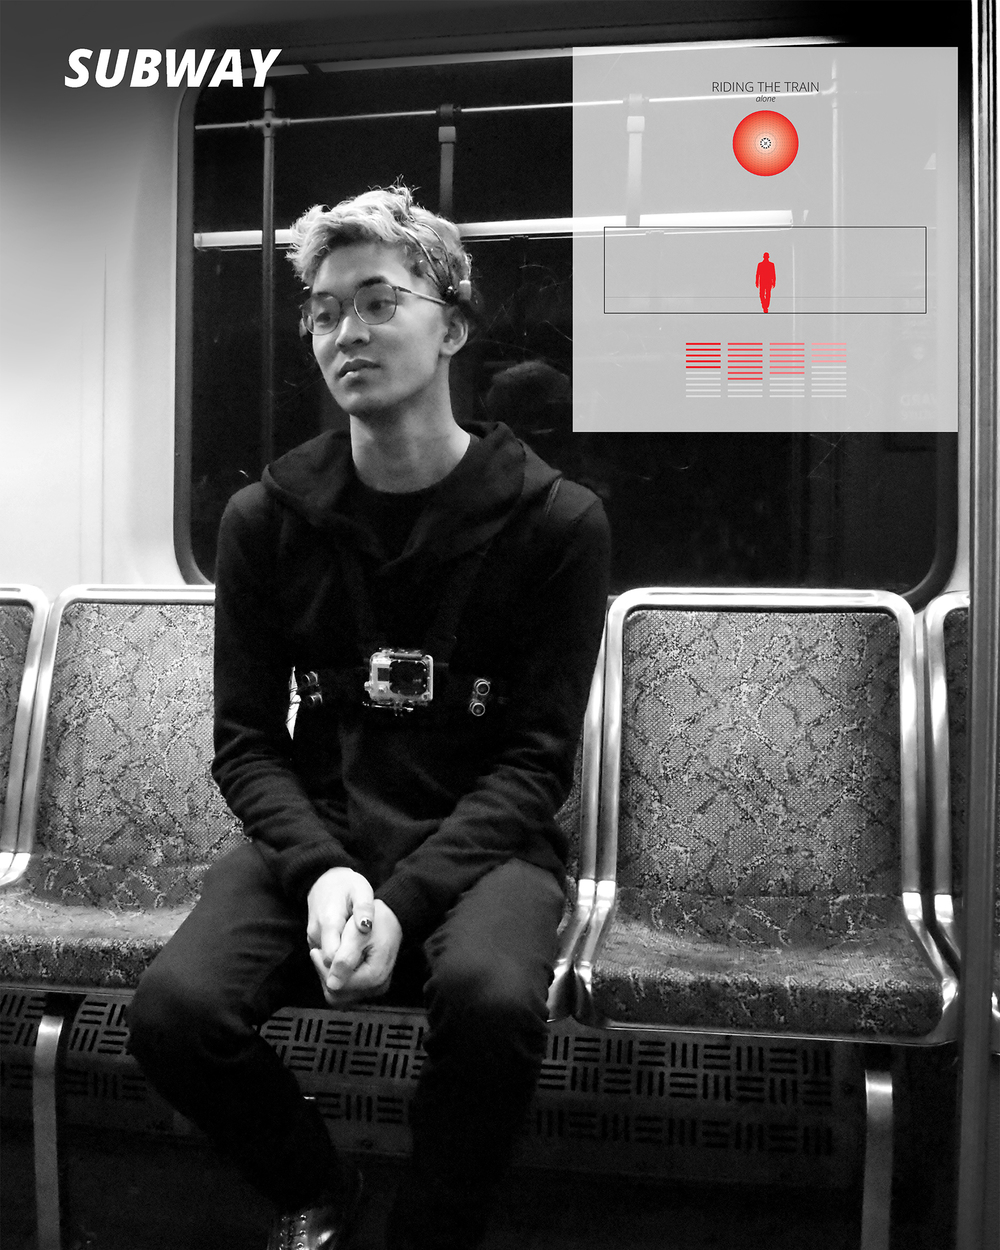 msc-subway.jpg